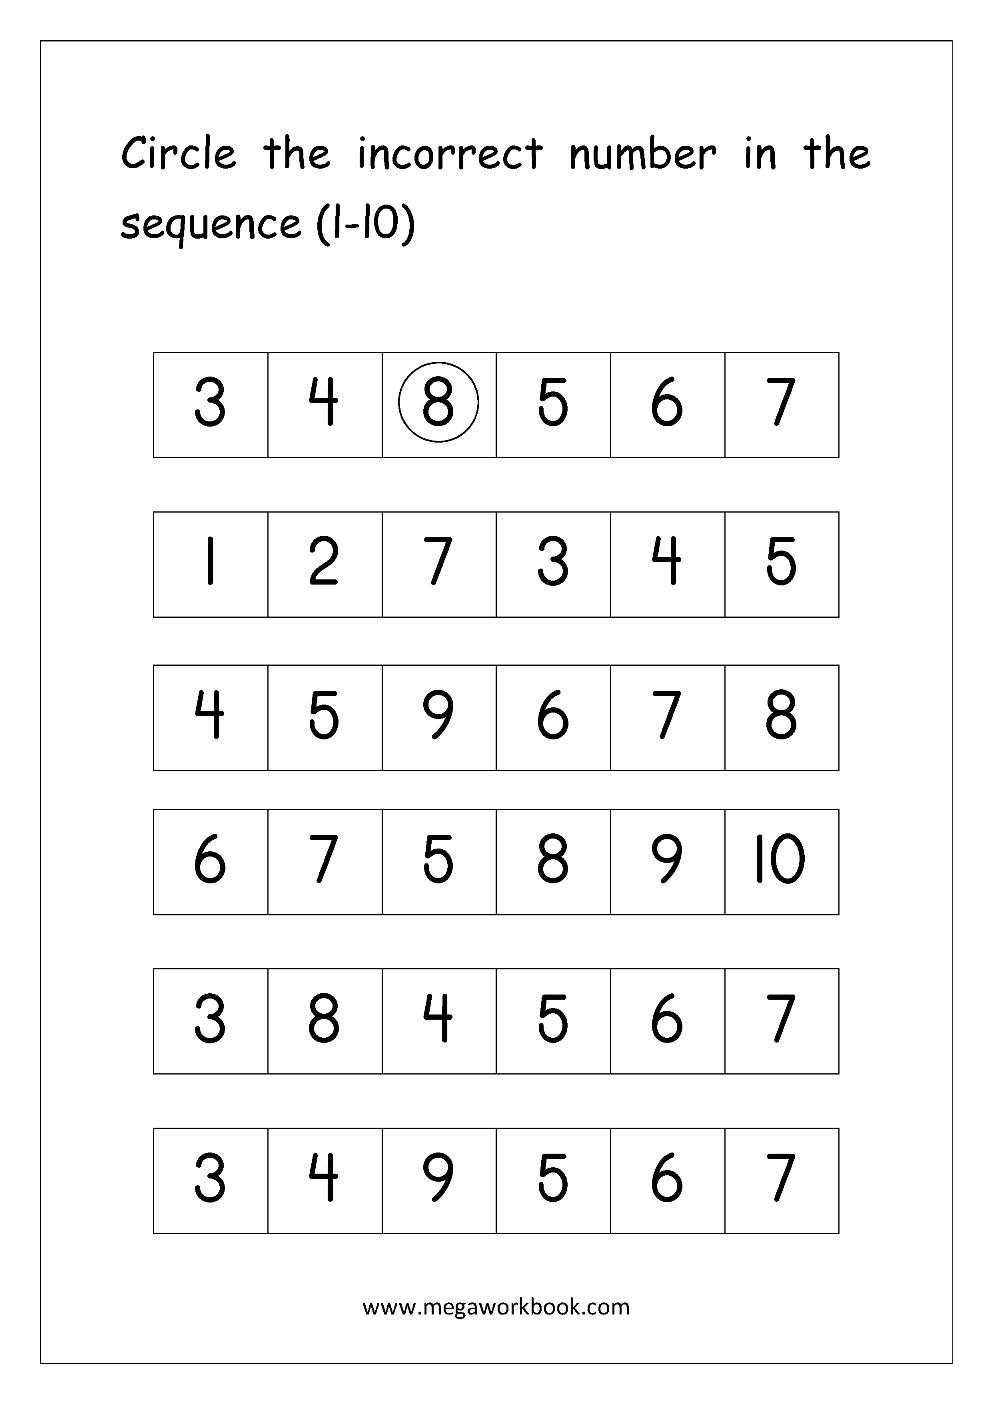 Workbooks sequencing numbers worksheets : Free Math Worksheets - Number Ordering and Missing Numbers ...